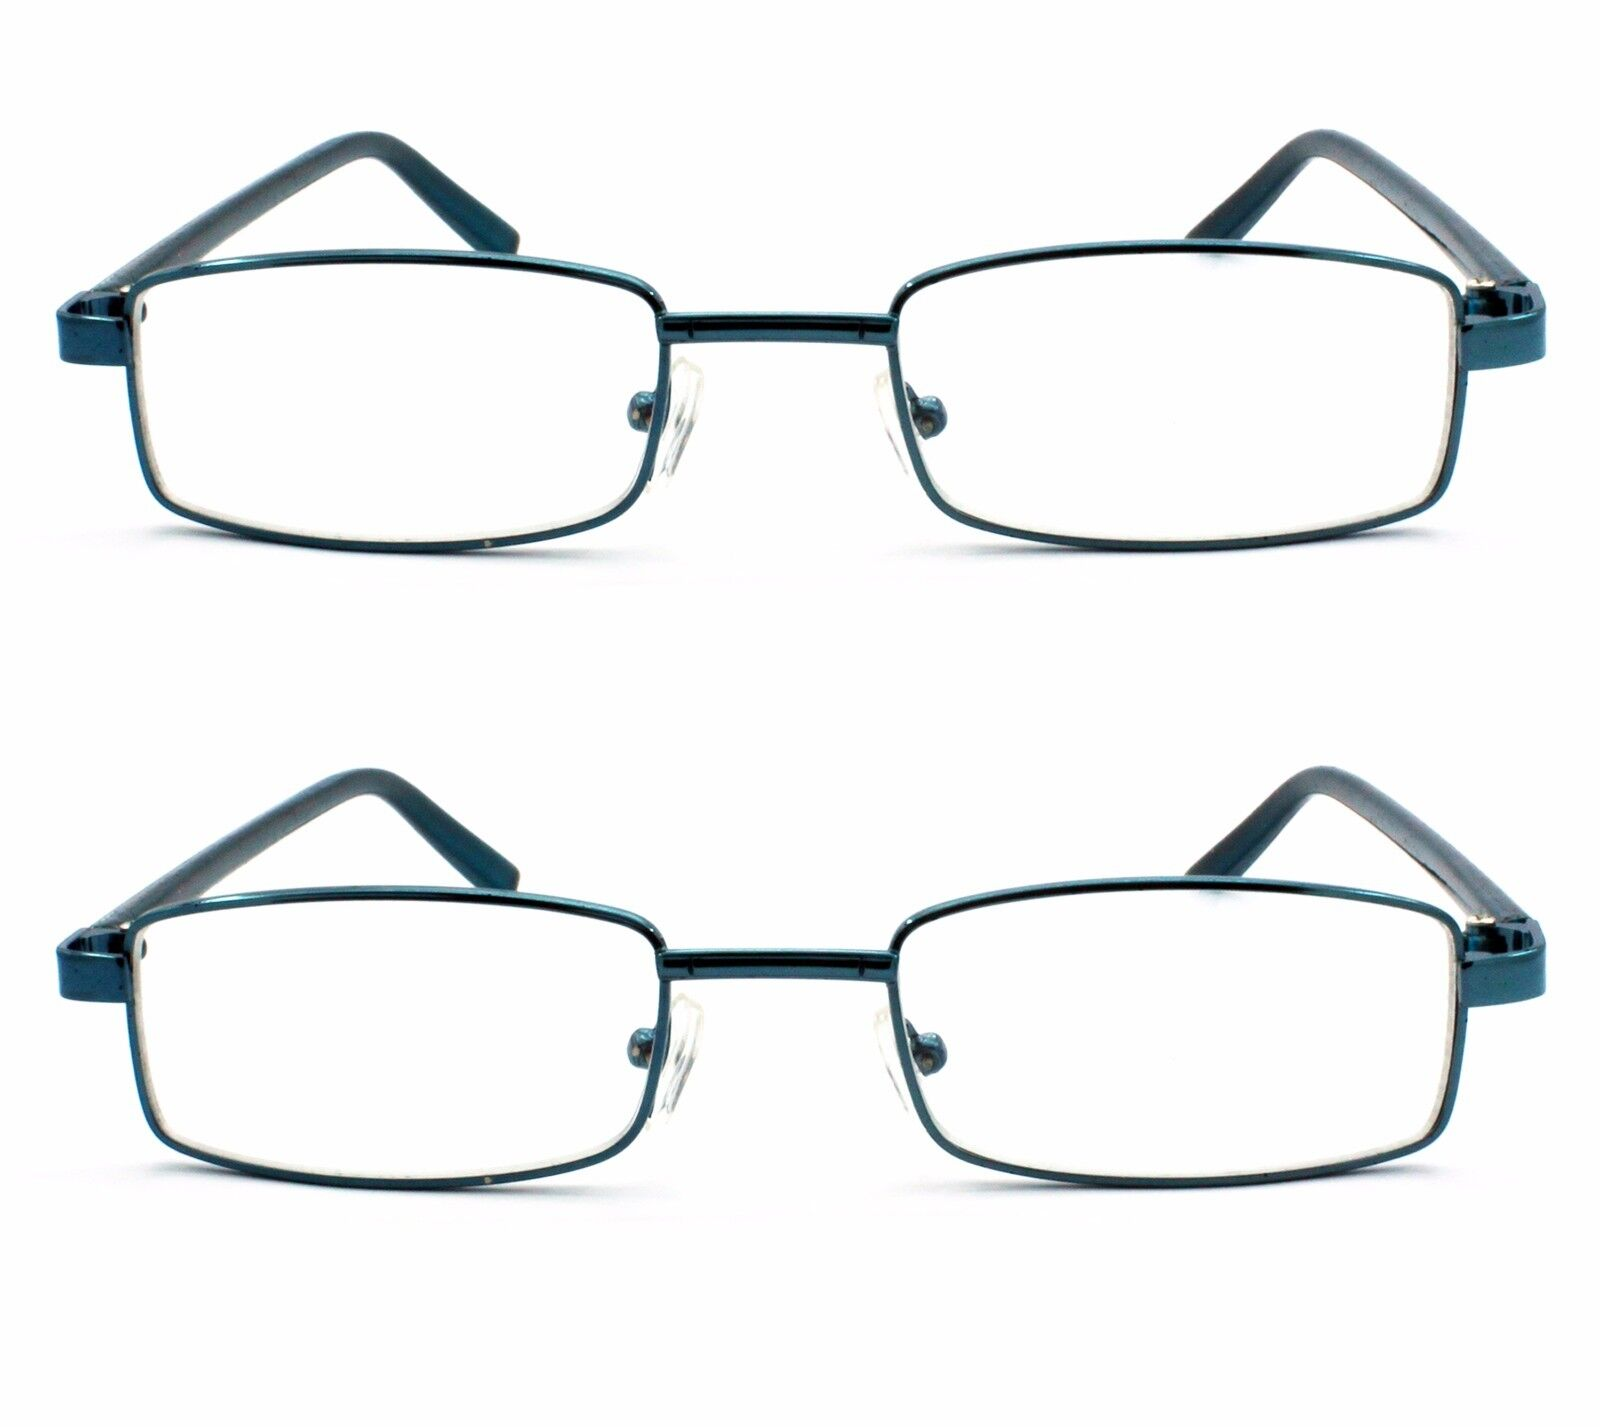 2 Pack Blue Color Metal Frame Reading Glasses with Hard ...